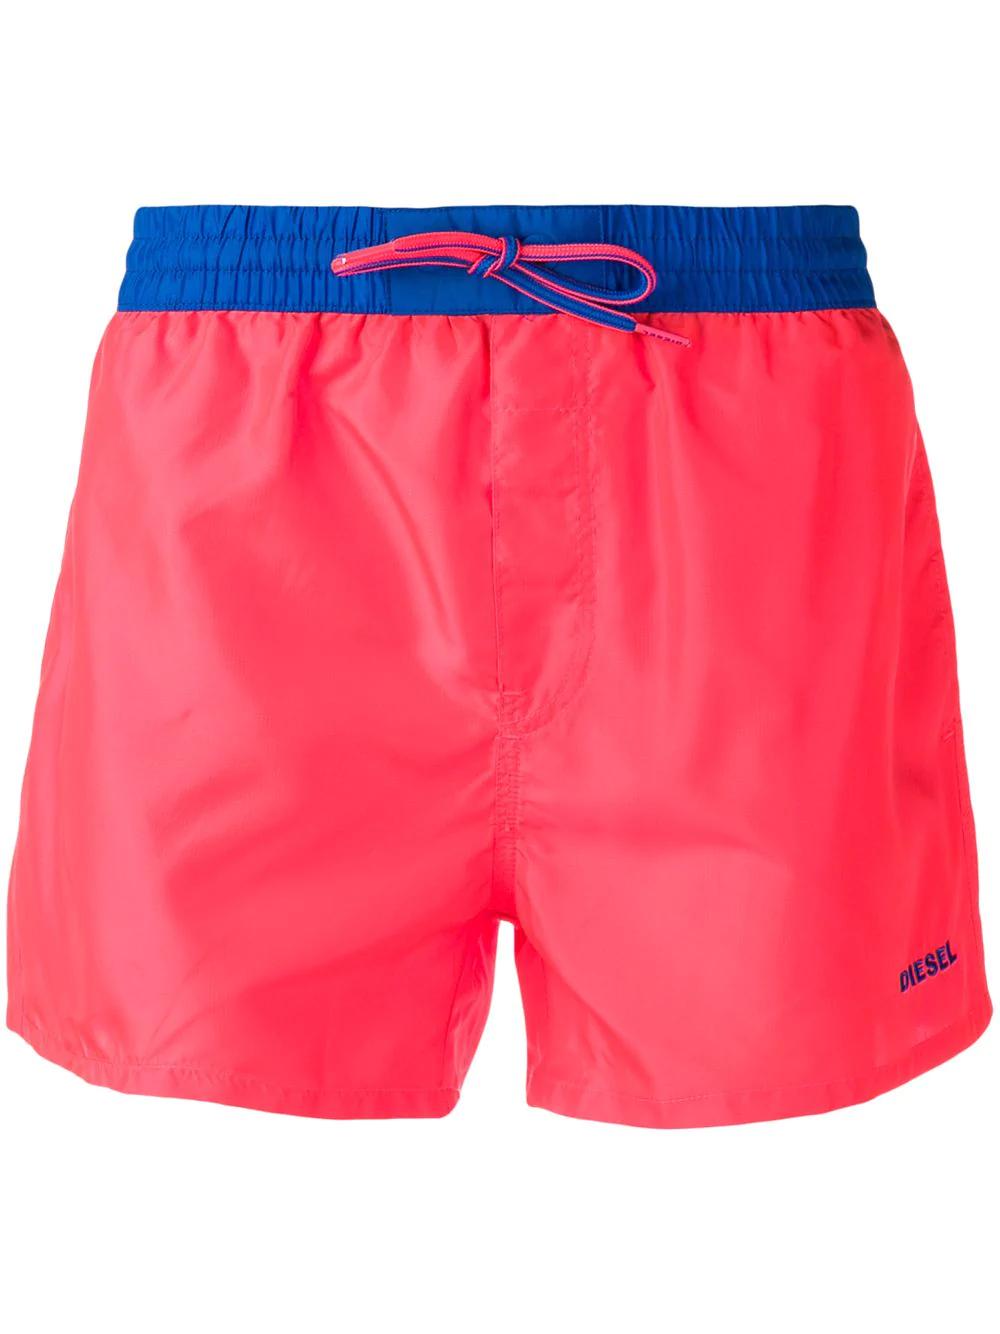 3834005a2255f Diesel Bmbx-Sandy 2.017 Swim Shorts - Pink | ModeSens